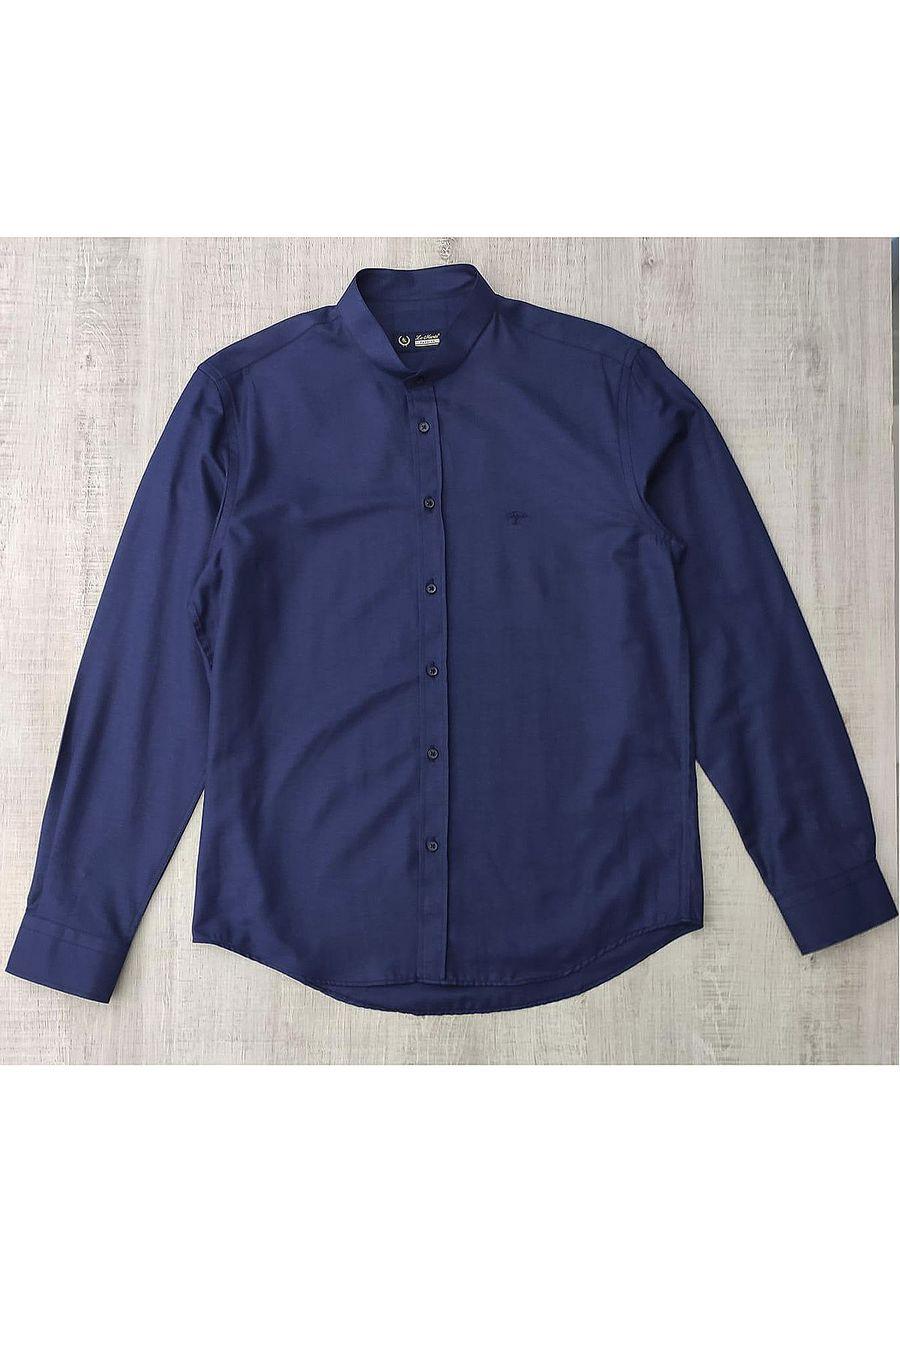 Рубашка мужская Le Marin 301 - фото 1